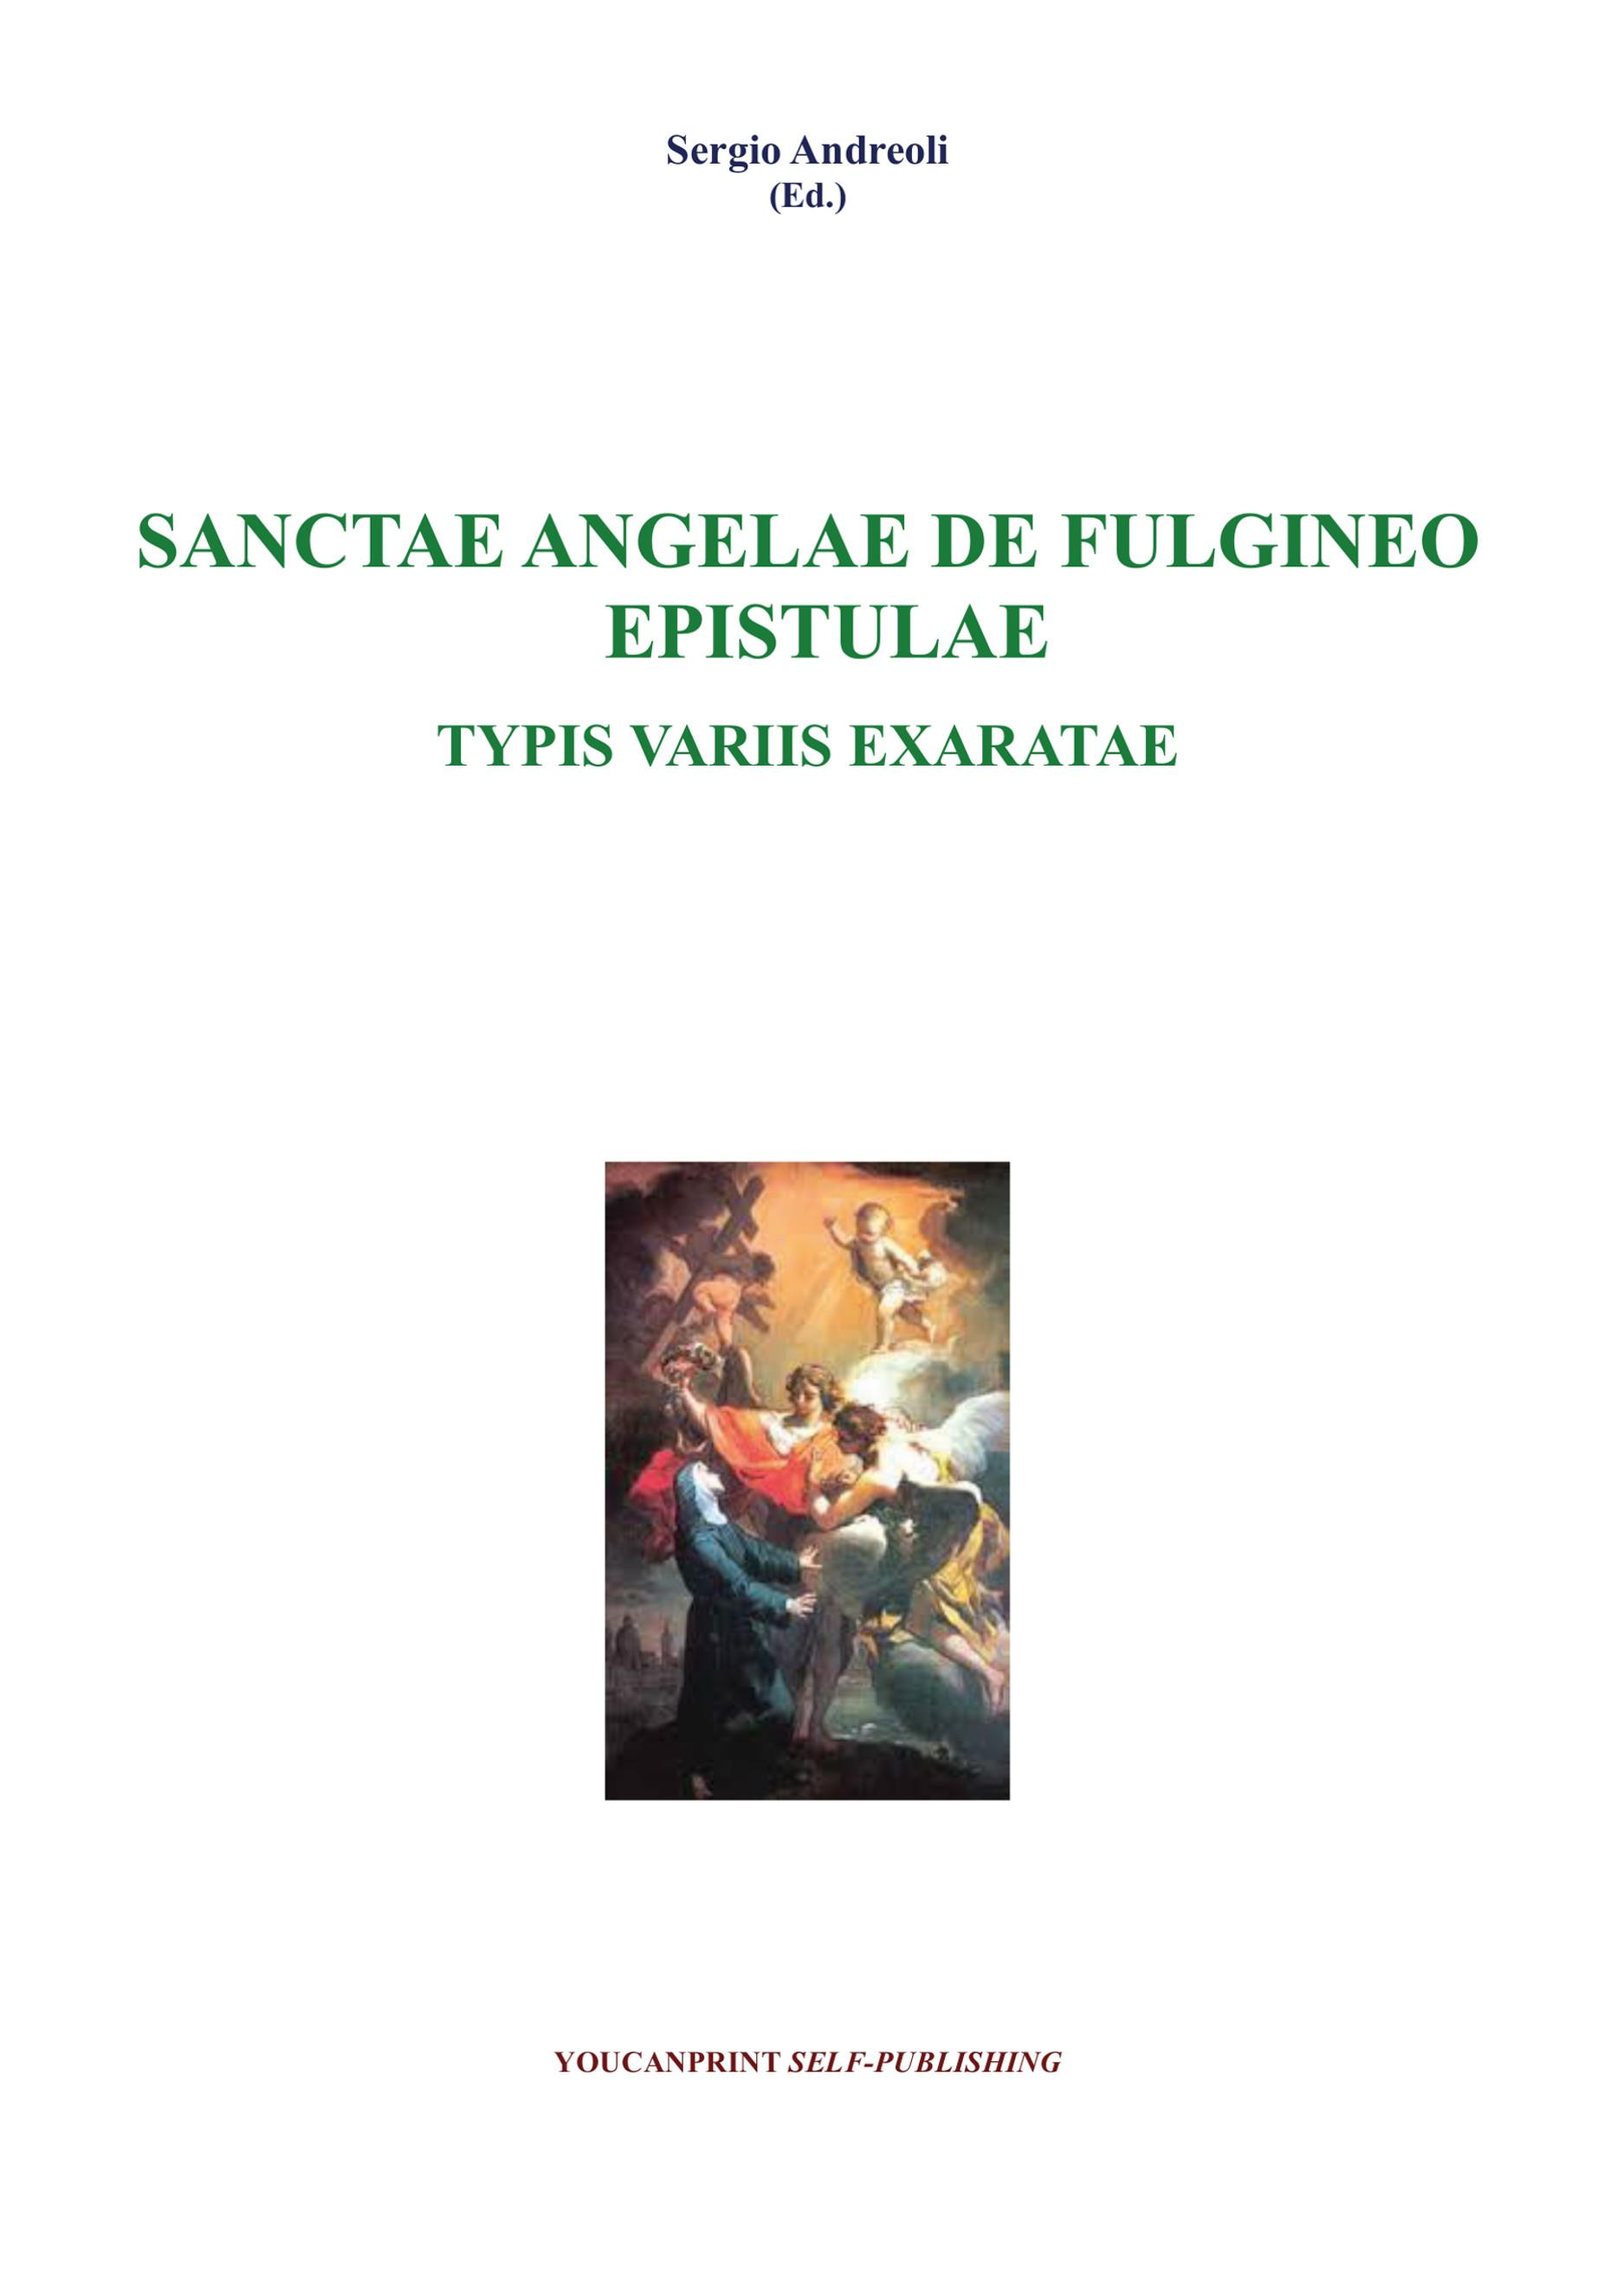 Sanctae Angelae De Fulgineo Epistulae Typis Variis Exaratae